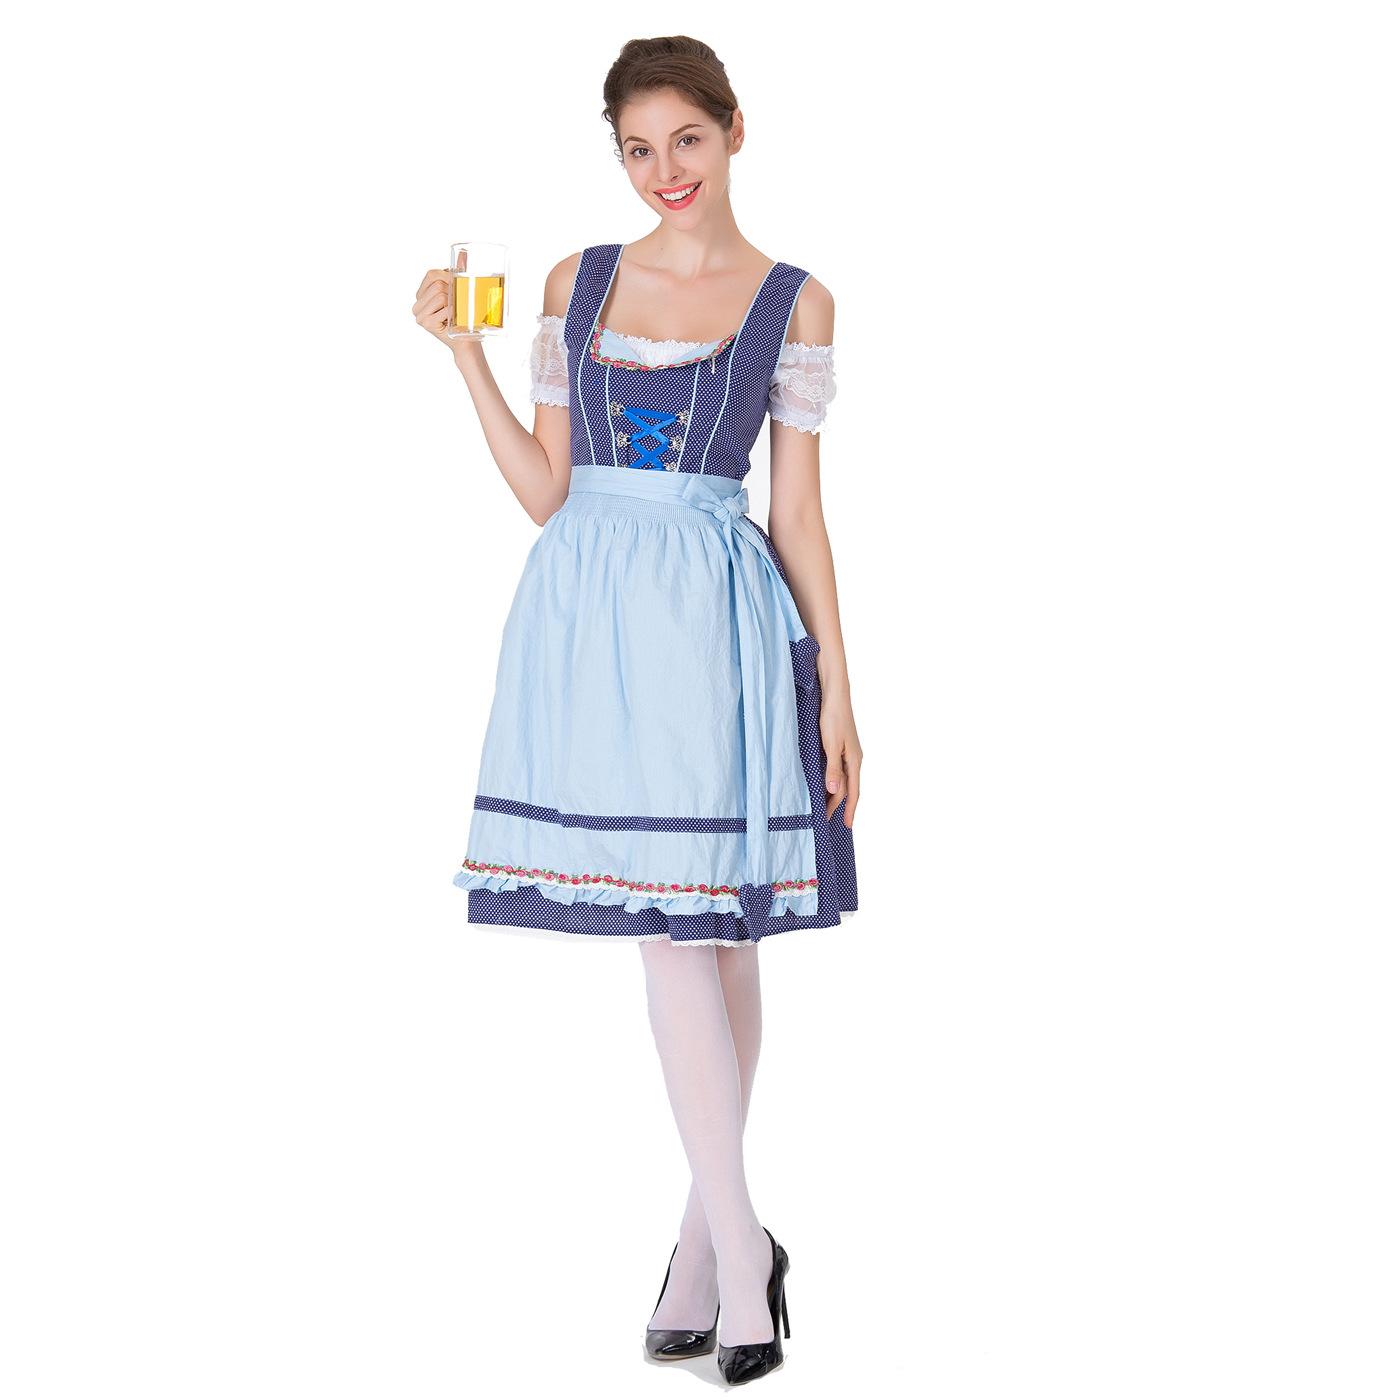 Women Large Size Oktoberfest Style Dirndl Dress Bavarian Style Waitress Halloween Costume blue_XL